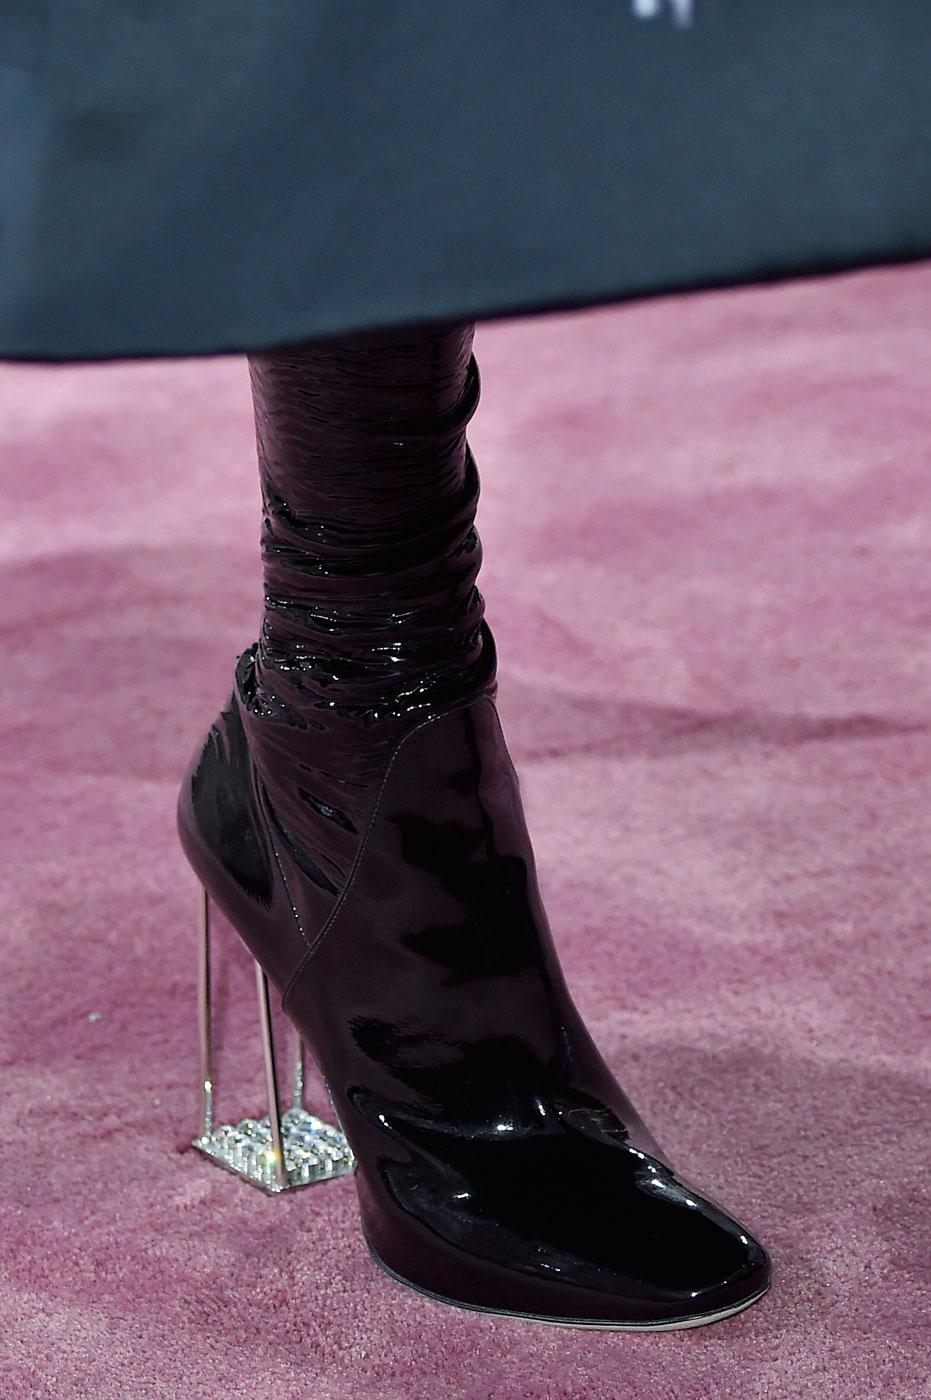 Christian-Dior-fashion-runway-show-close-ups-haute-couture-paris-spring-summer-2015-the-impression-030